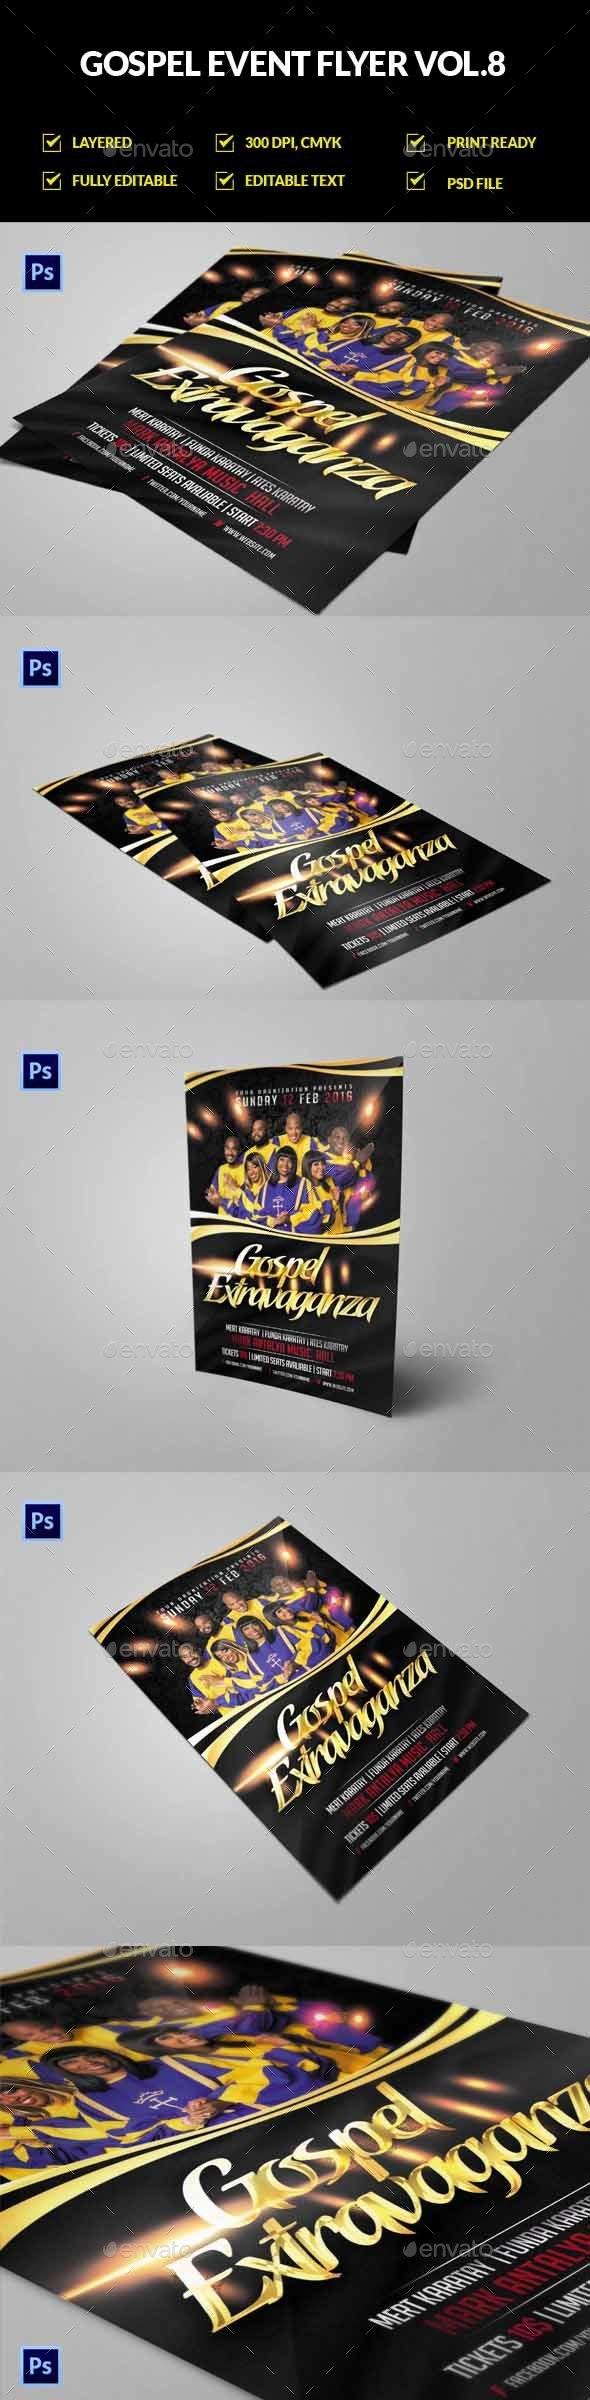 Gospel / Church Event Flyer Vol.8 - Church Flyers